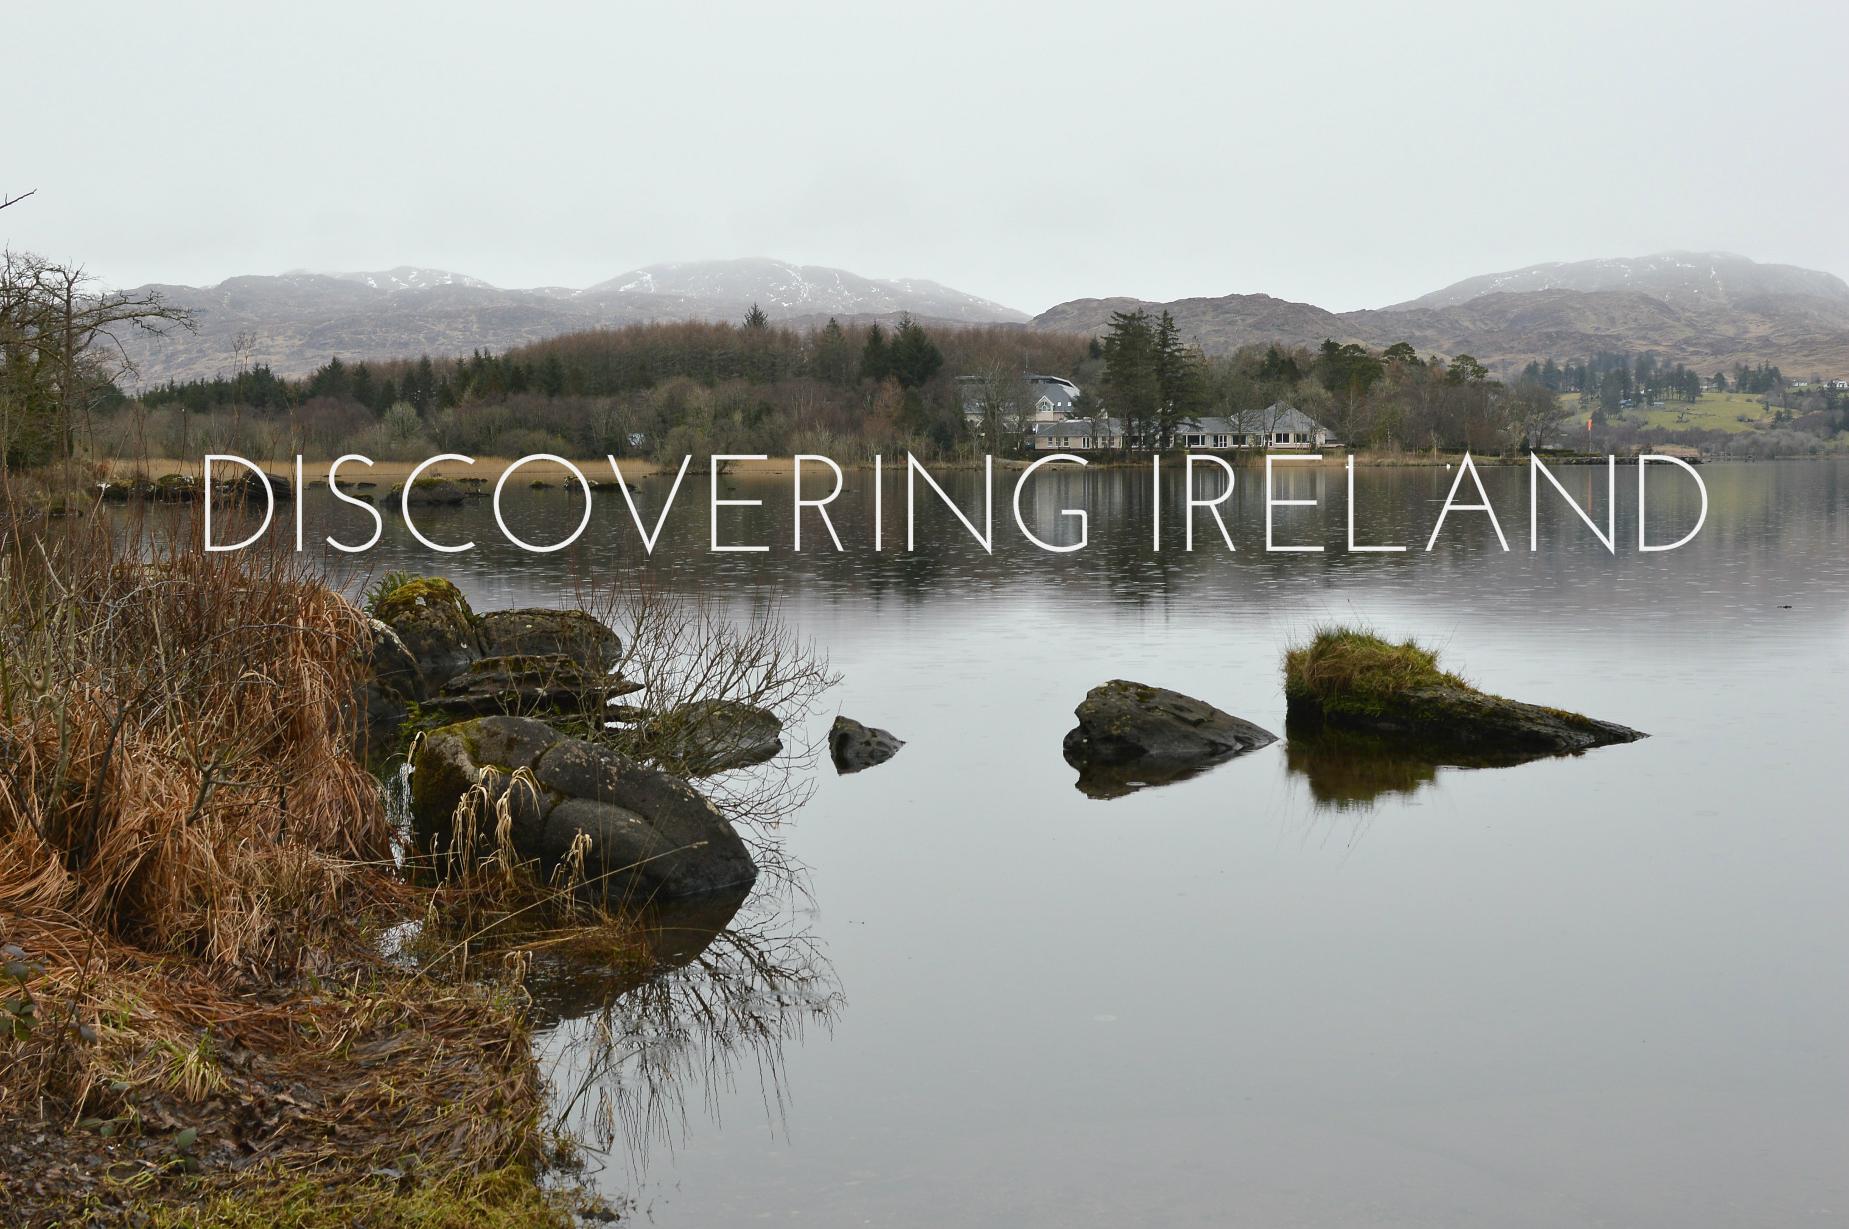 Lough Eske YOU TUBE COVER